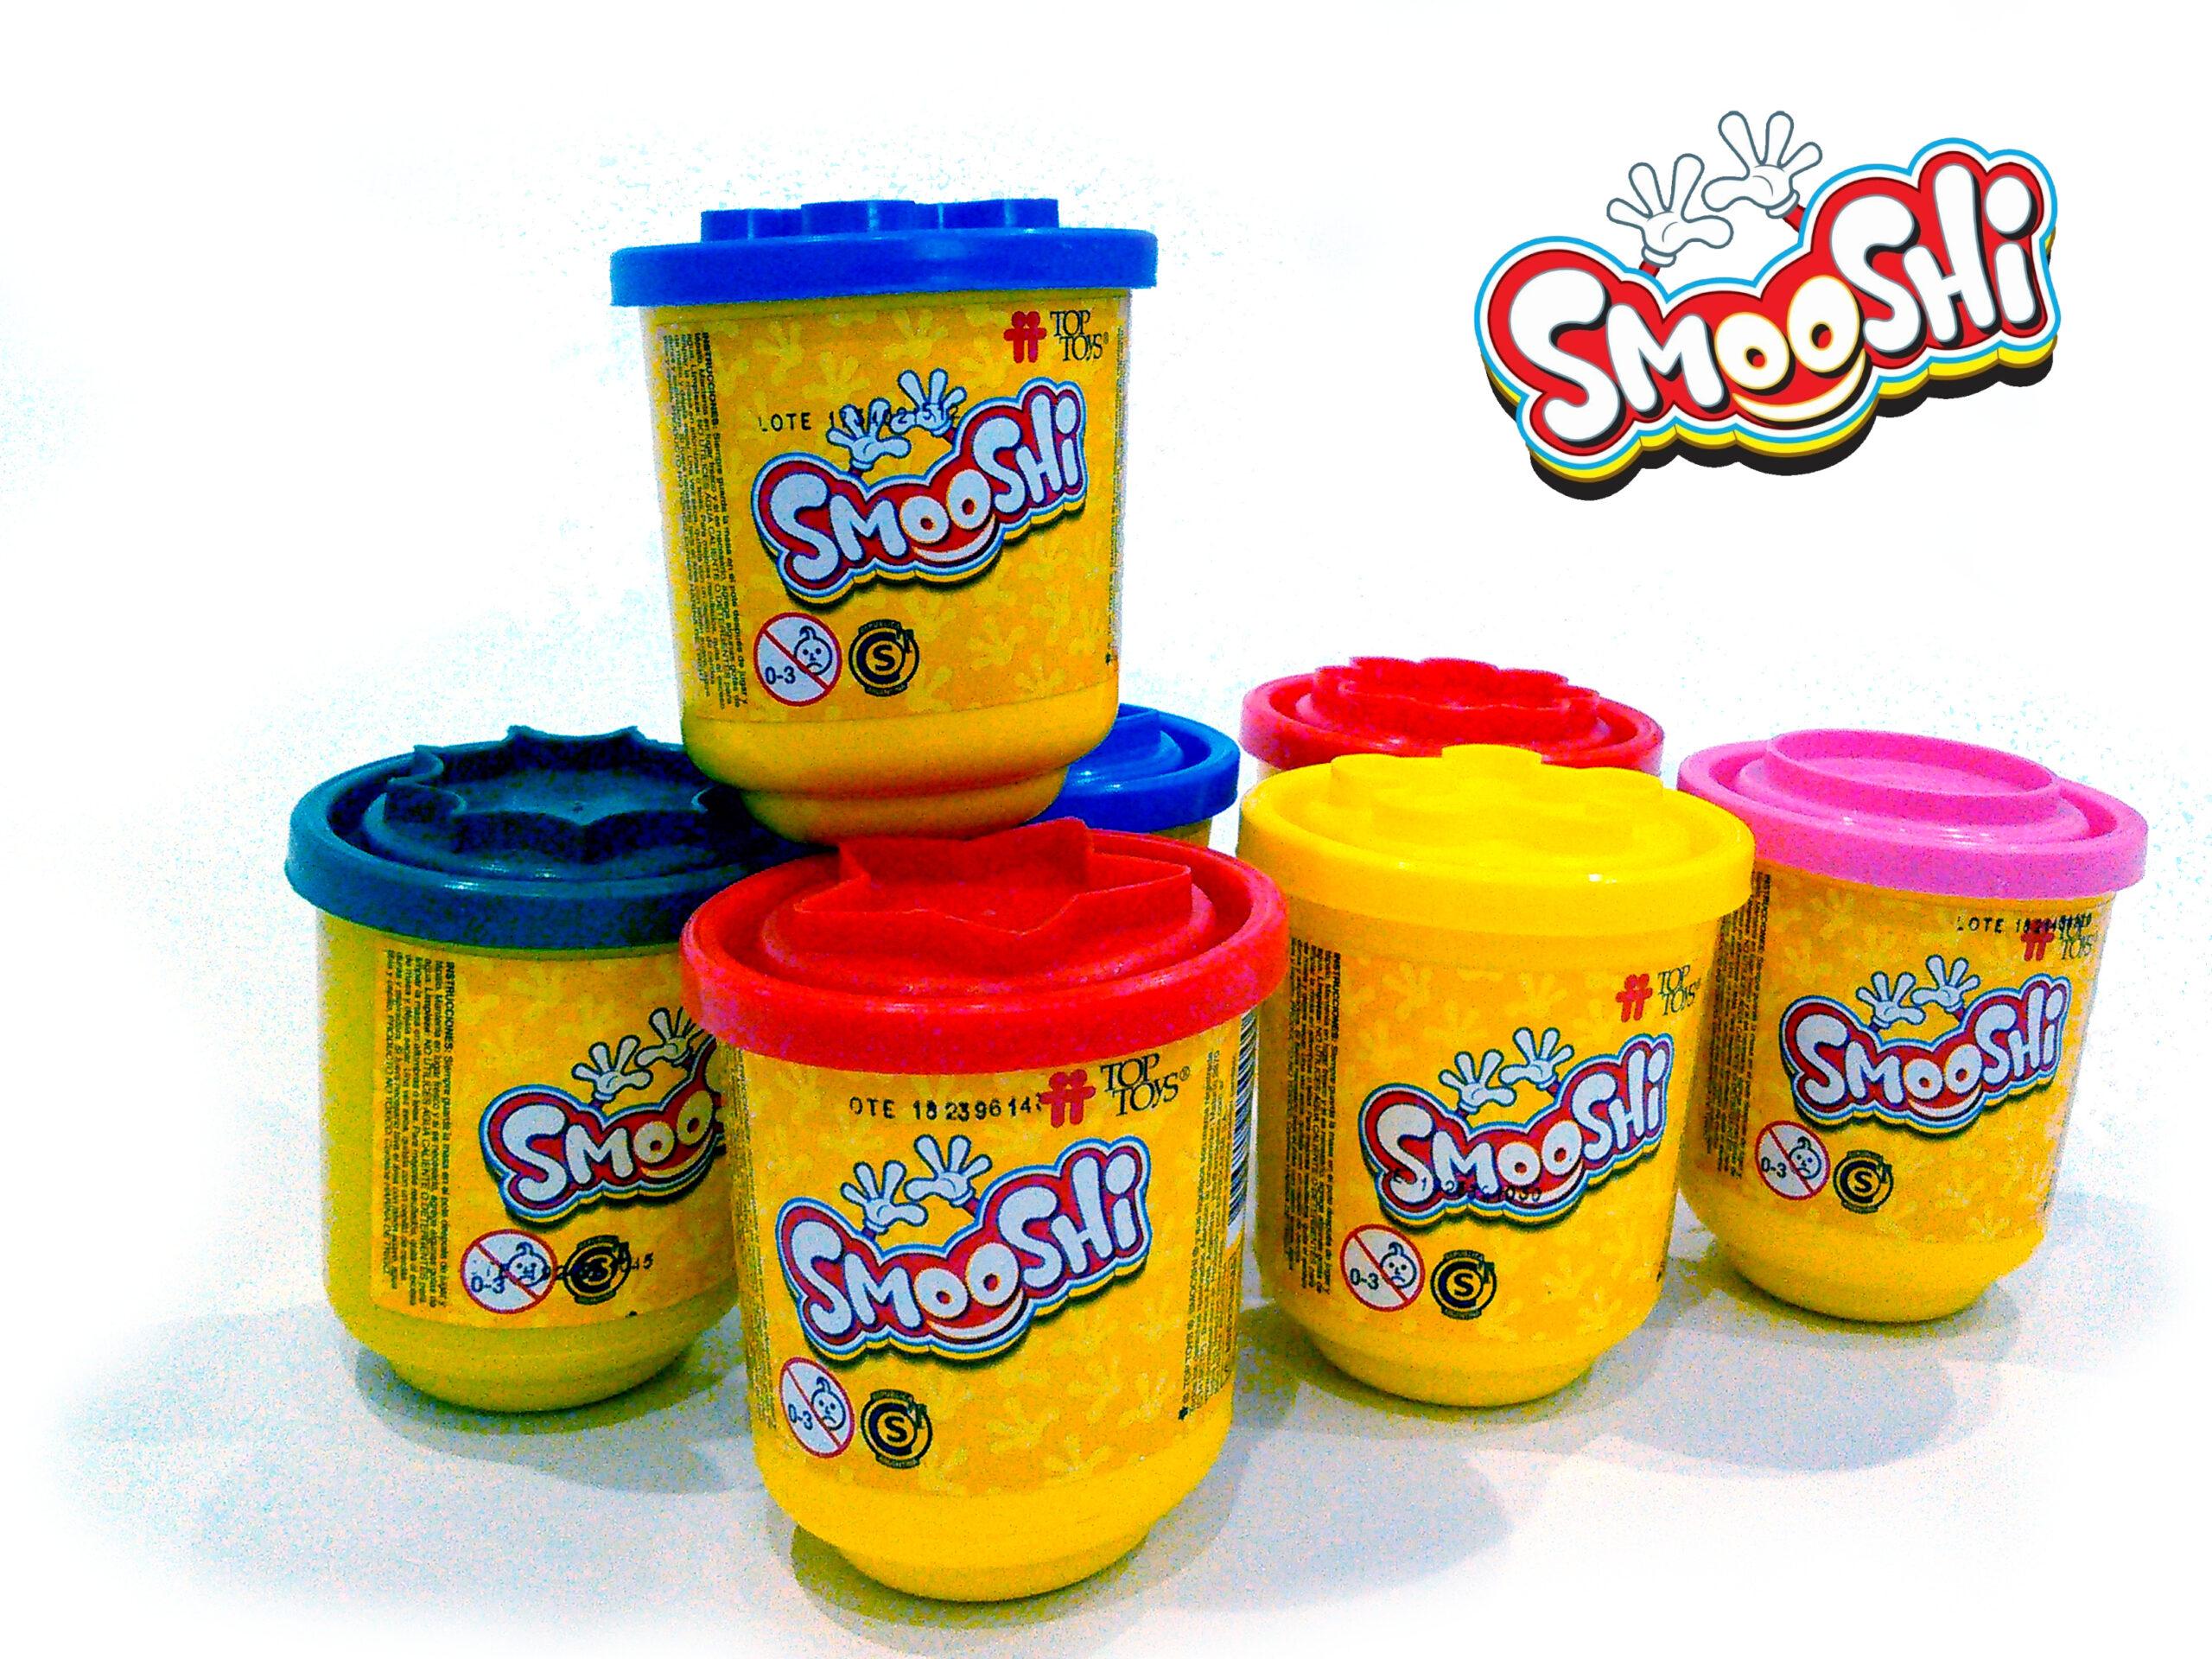 Smooshi Mix Colores Potes Simples - ¡Tu súpermasa para jugar! Juego Infantil | TOP TOYS